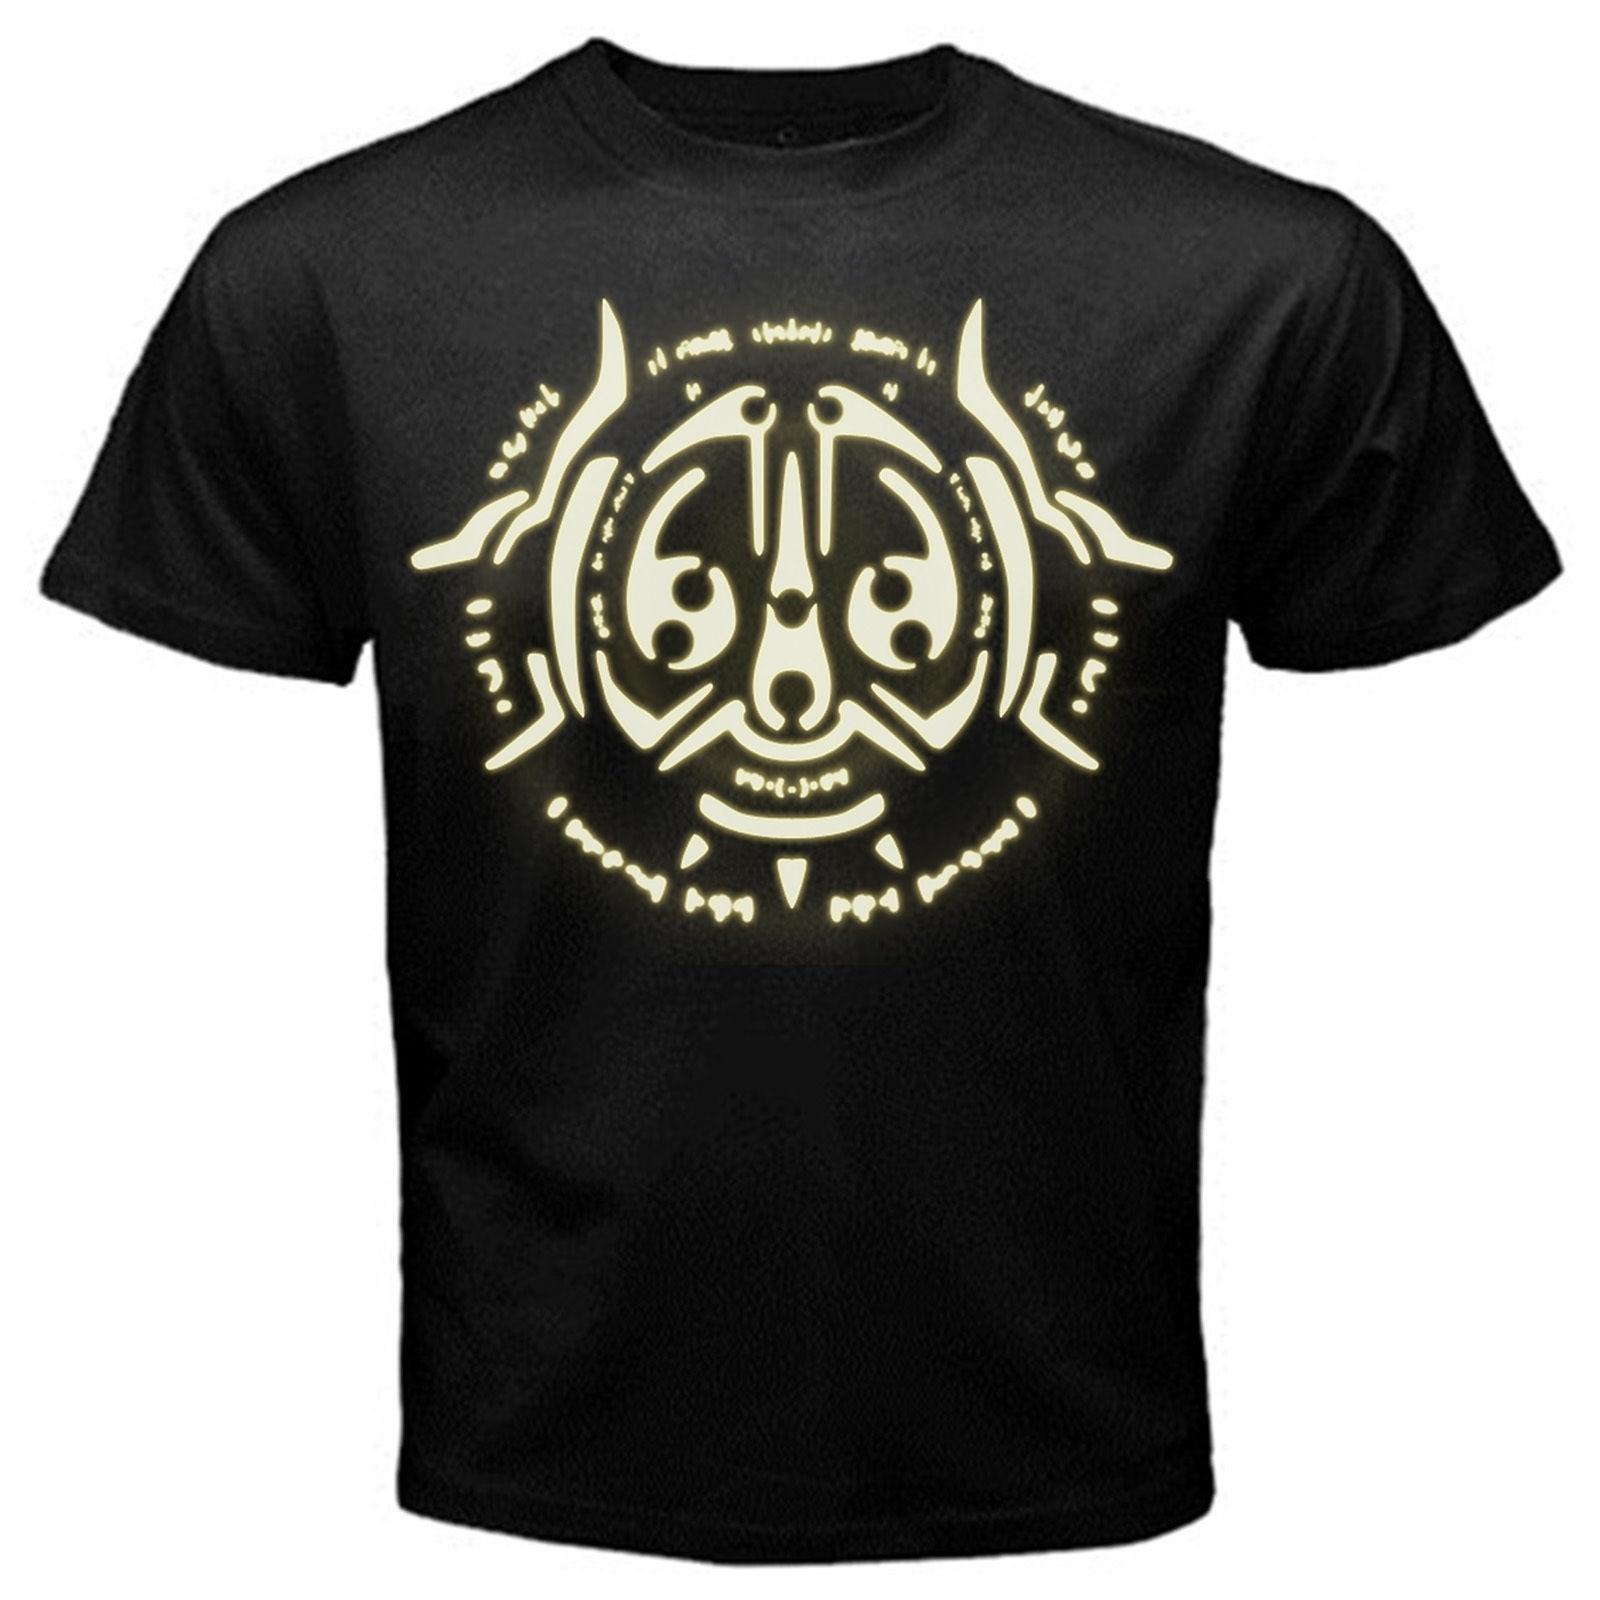 Bayonetta Auditio Cardinal Virtue Classic Retro Game T-Shirt Black Basic Tee